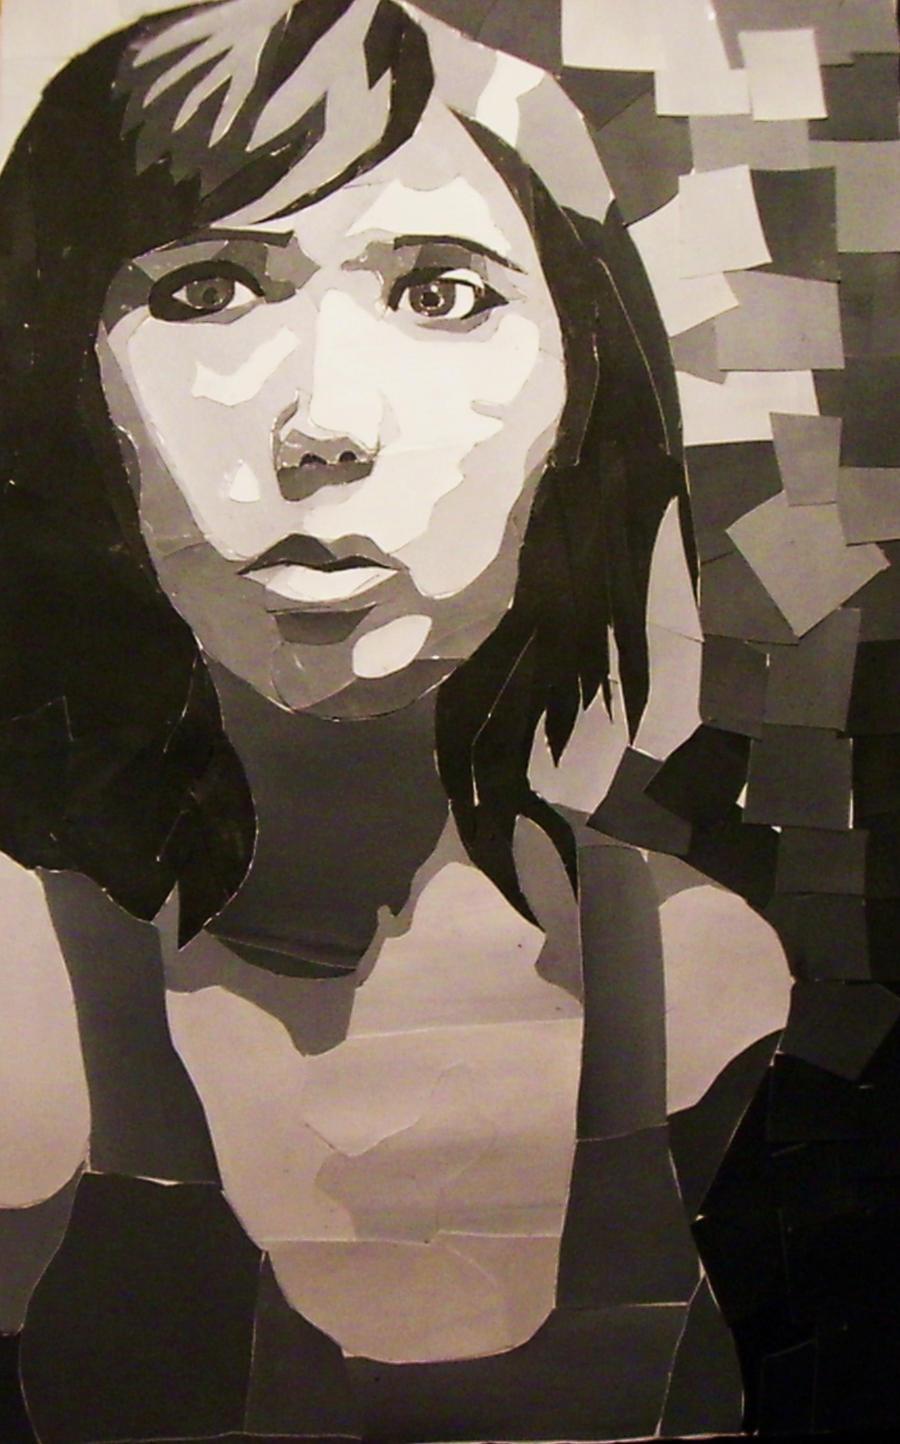 Self Portrait Collage by DodosConundrum